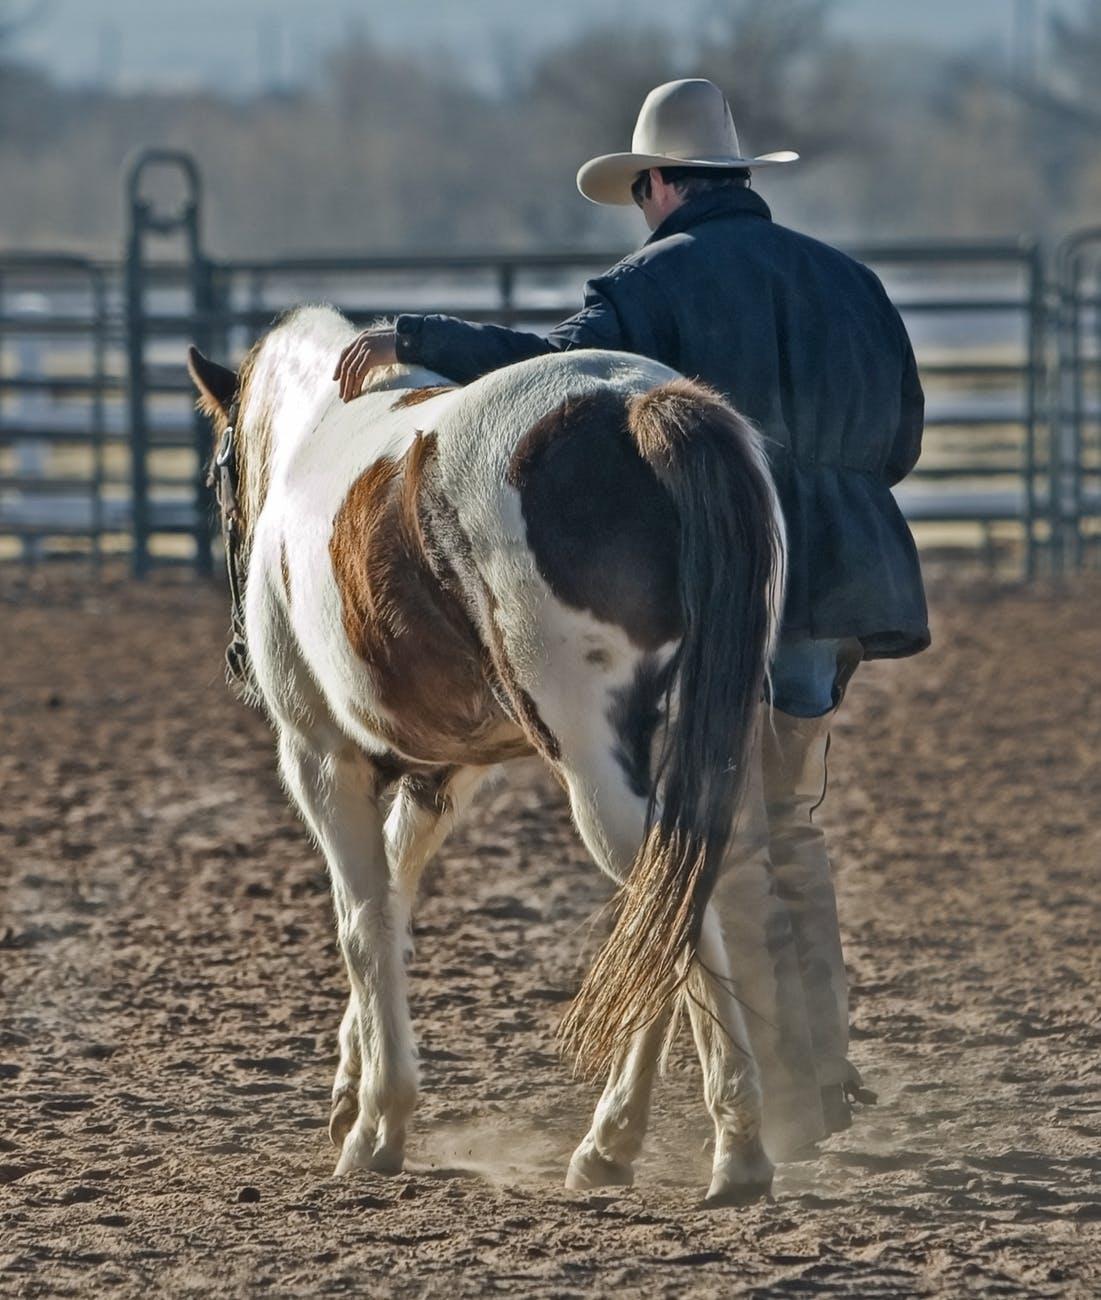 Saddle Up The Journey Begins Cowboyaccountant Com